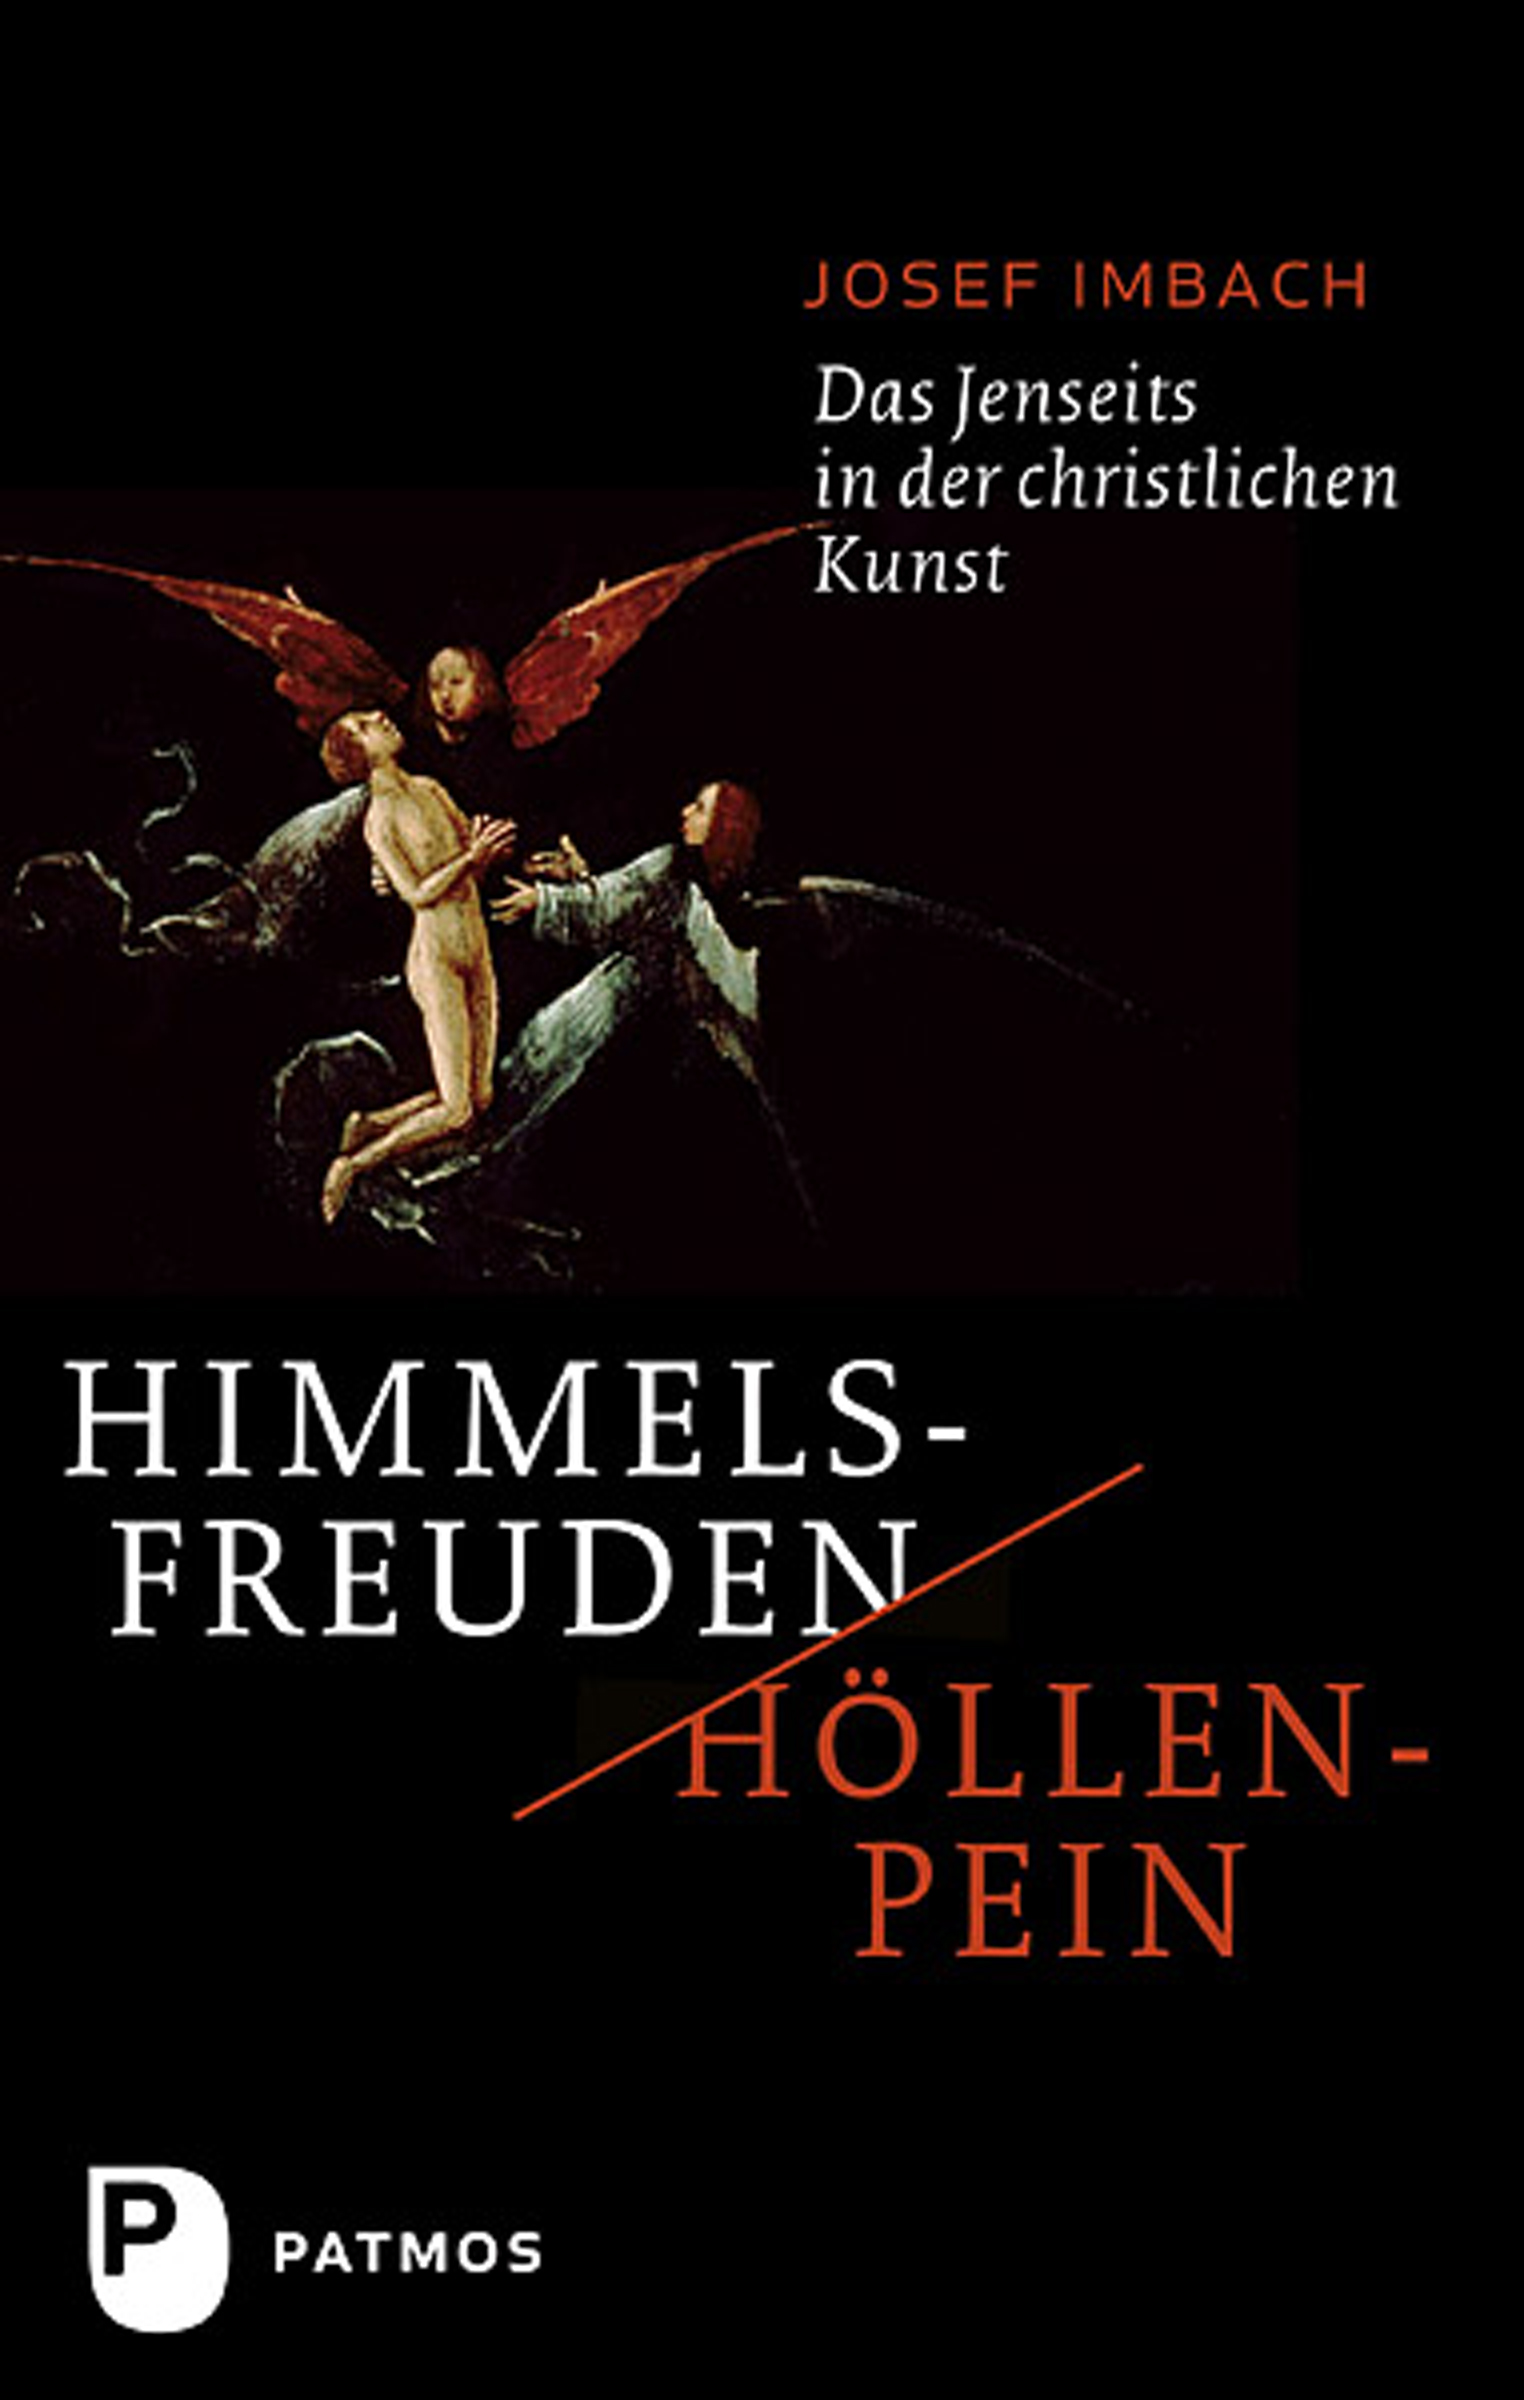 Josef Imbach Himmelsfreuden - Höllenpein